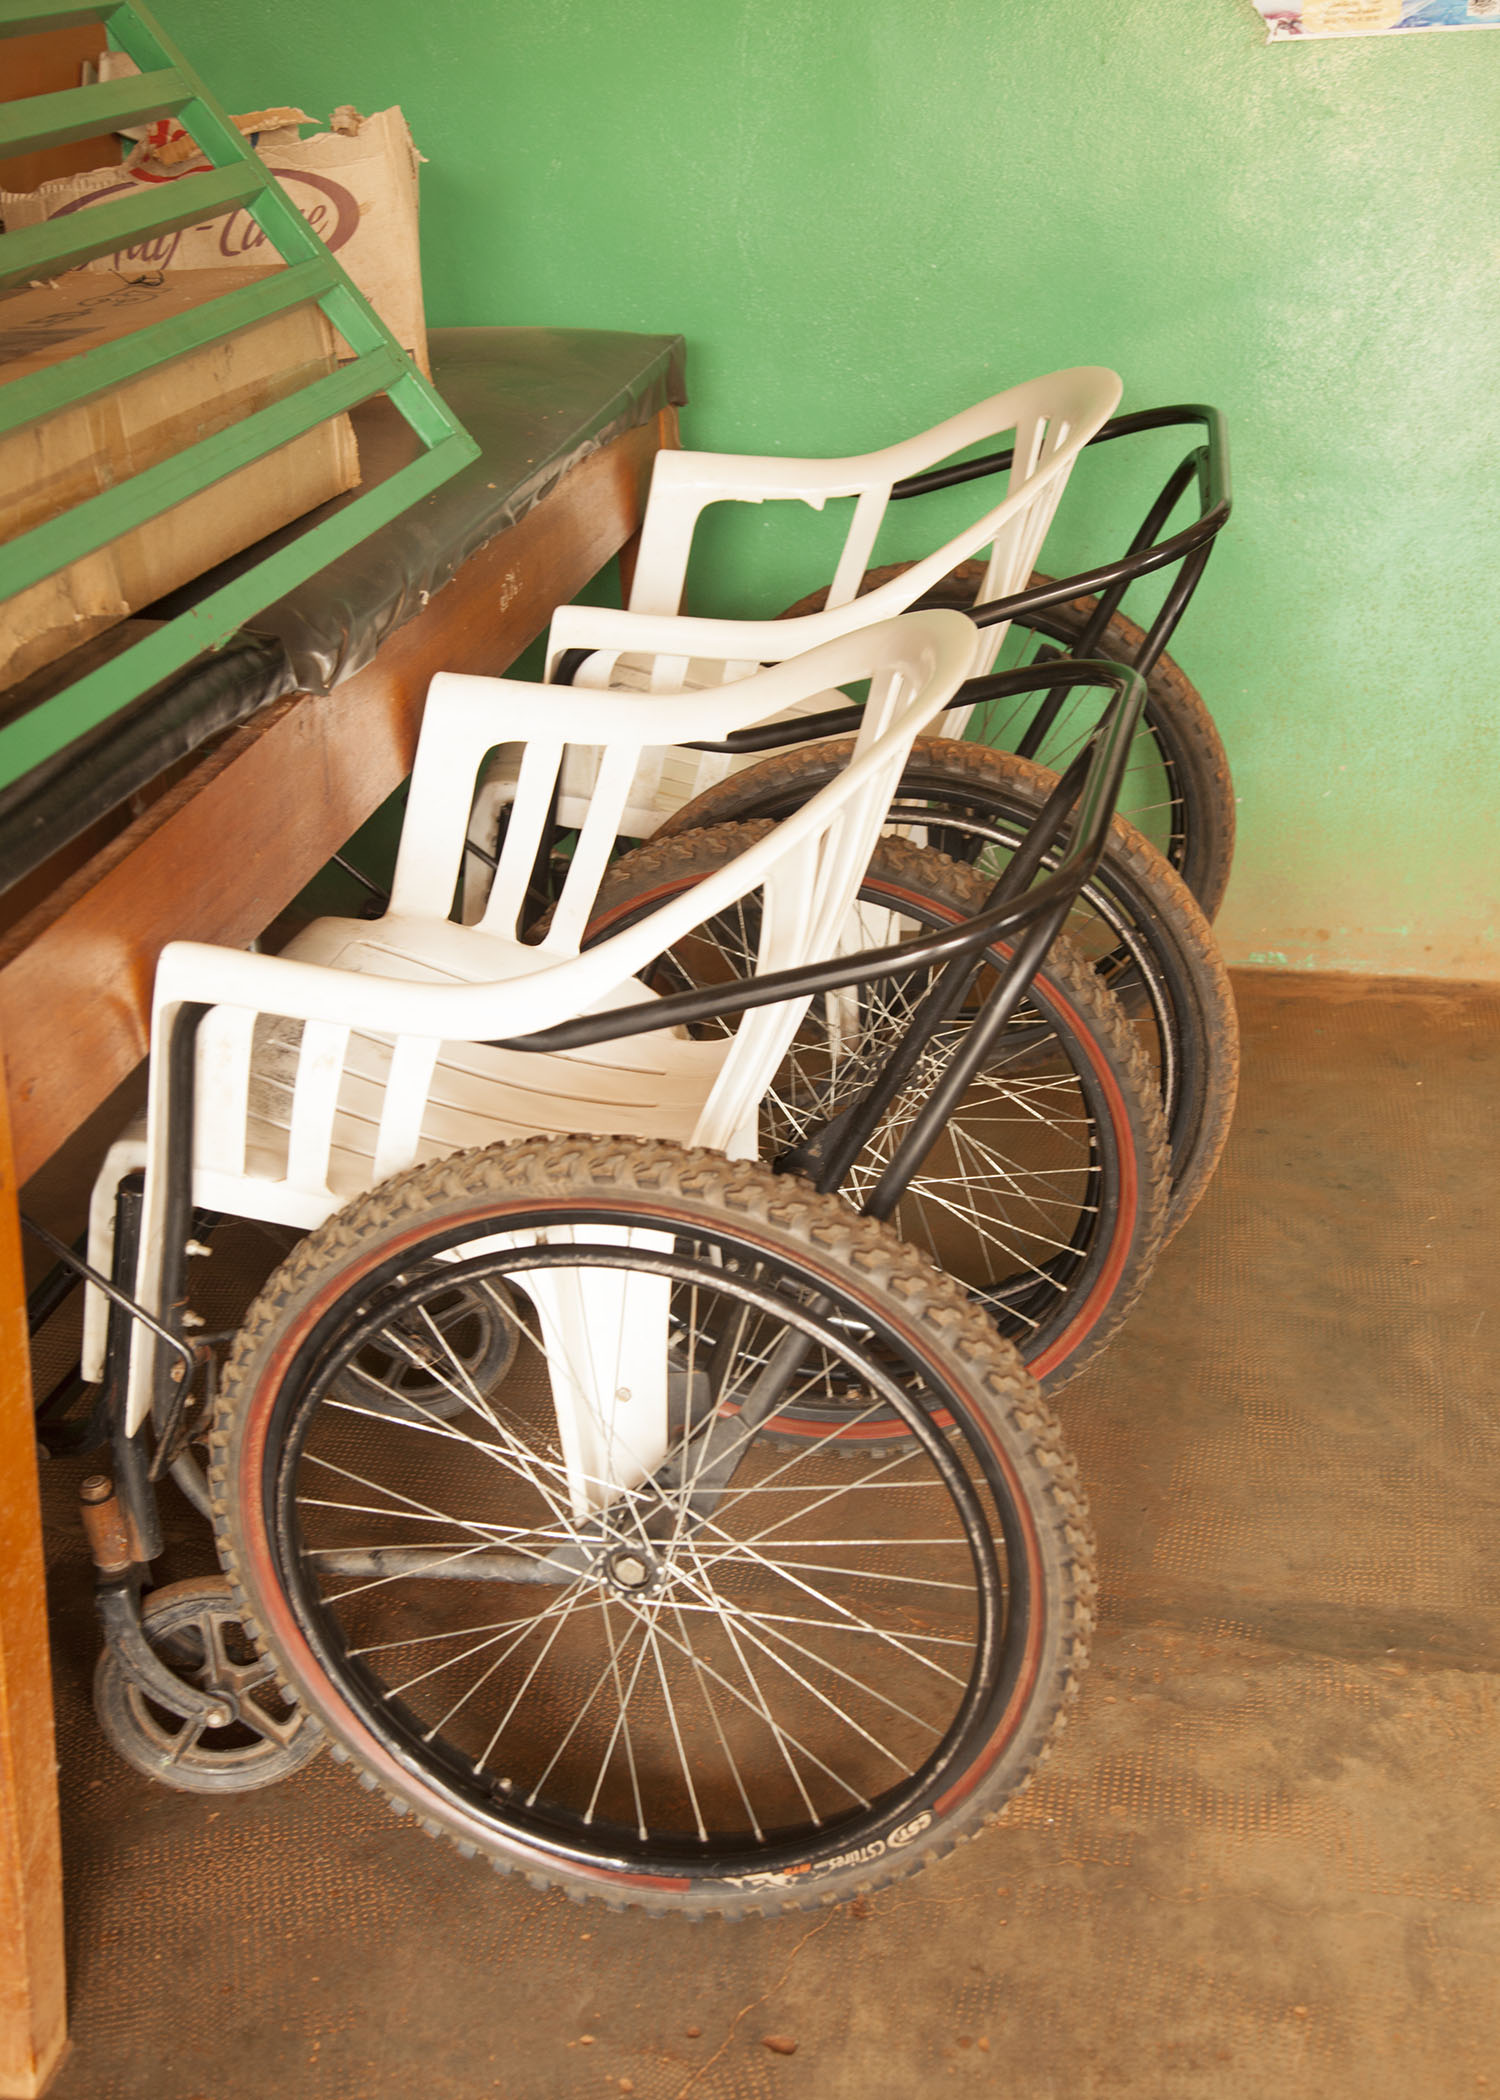 Wheel chairs 1.jpg